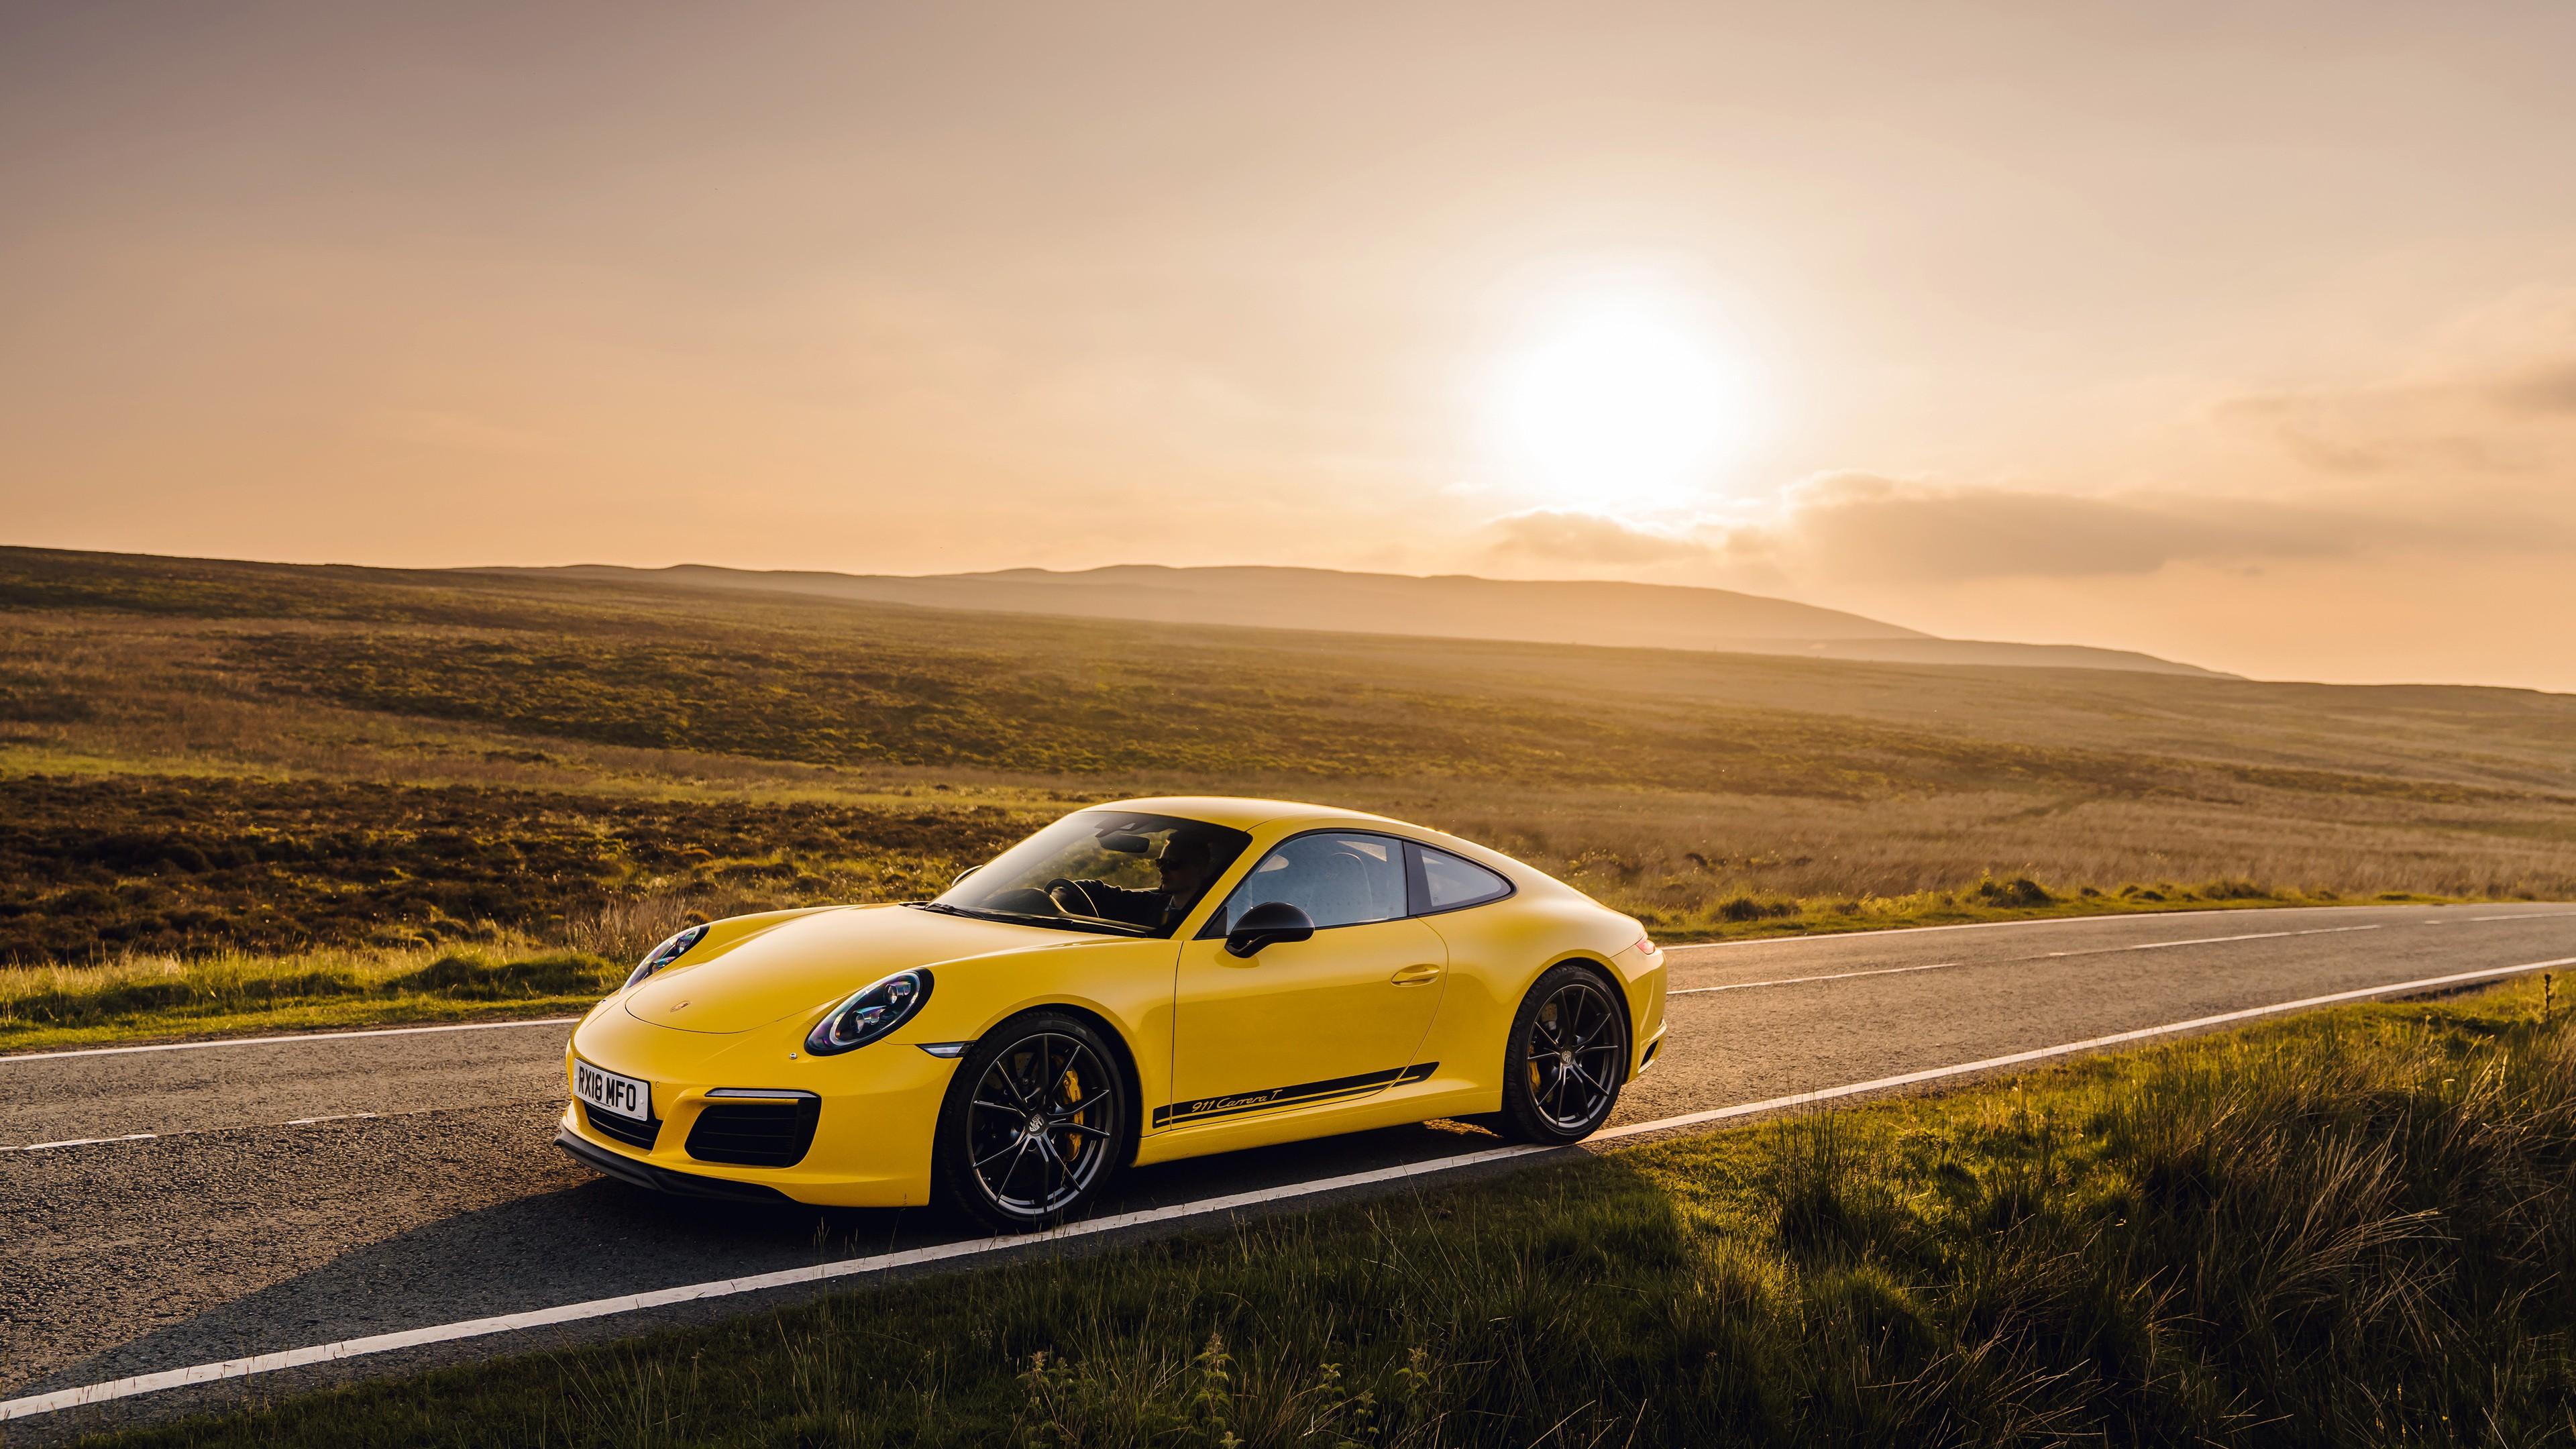 Porsche 911 Carrera T Coupe 2018 4k Wallpaper Hd Car Wallpapers Id 10902 Porsche 911 carrera t coupe 2018 4k